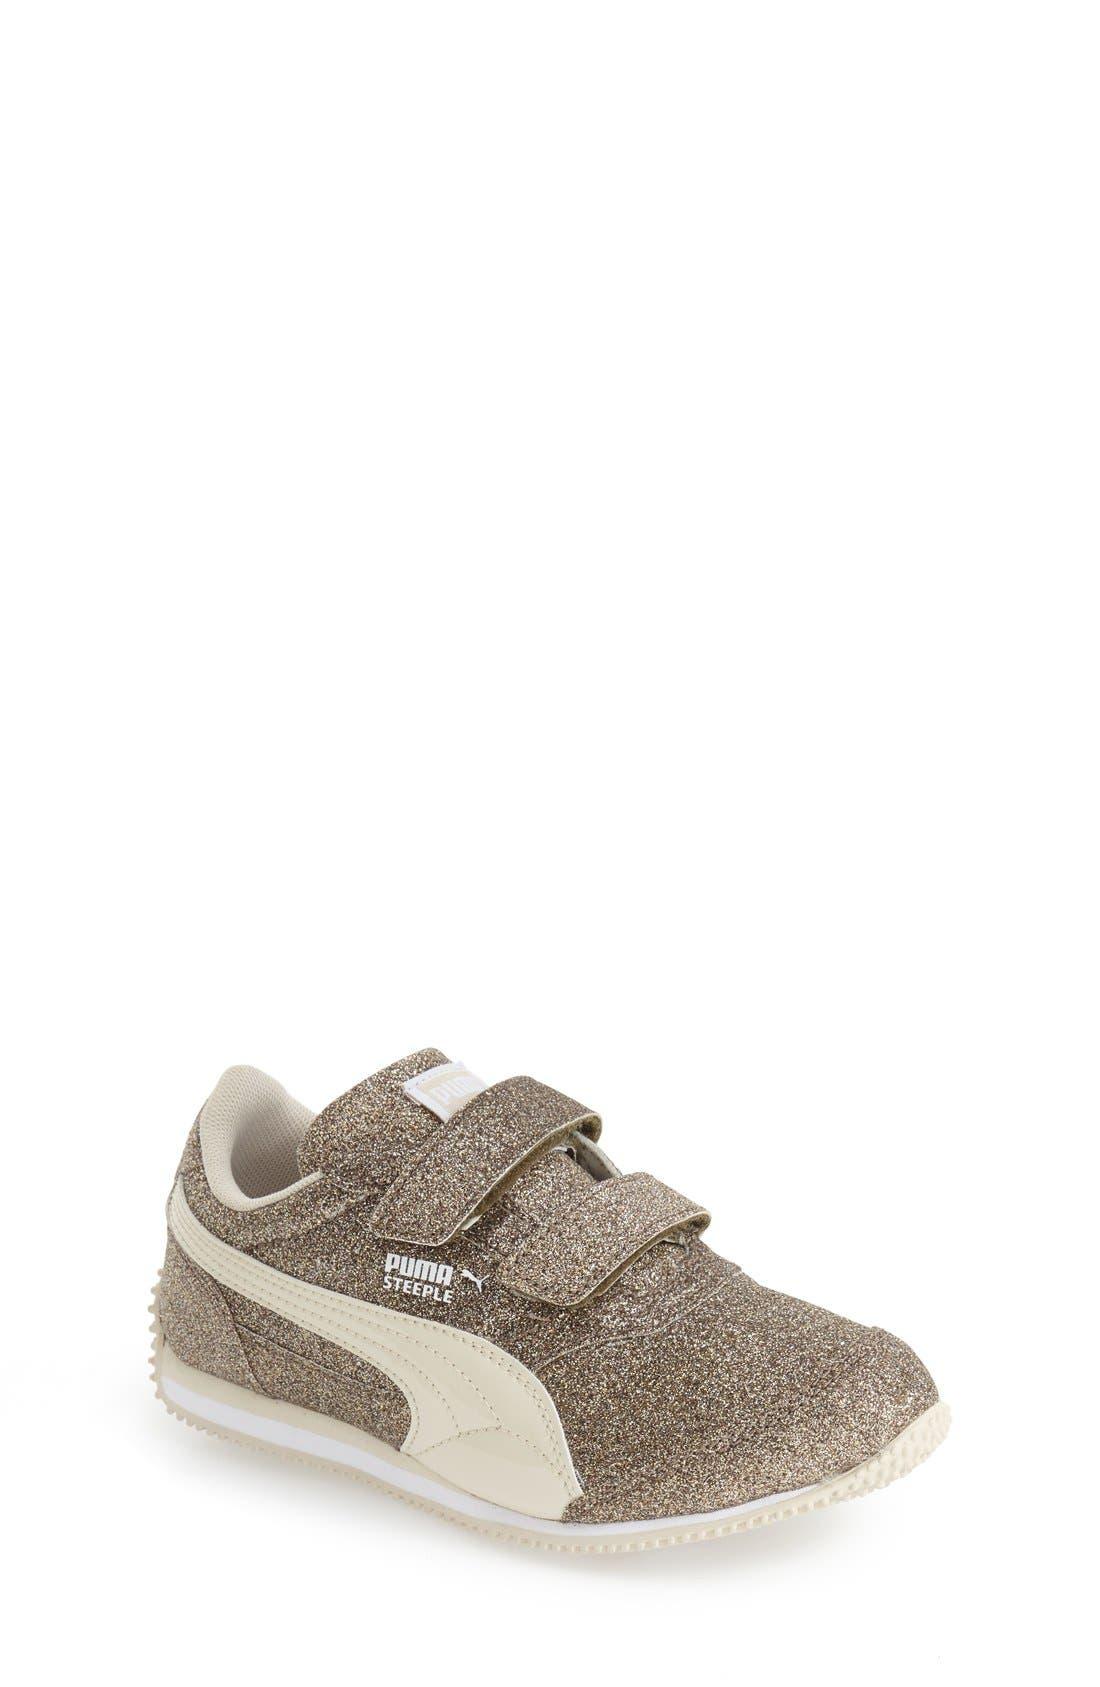 PUMA 'Steeple Glitz' Sneaker (Toddler, Little Kid & Big Kid)